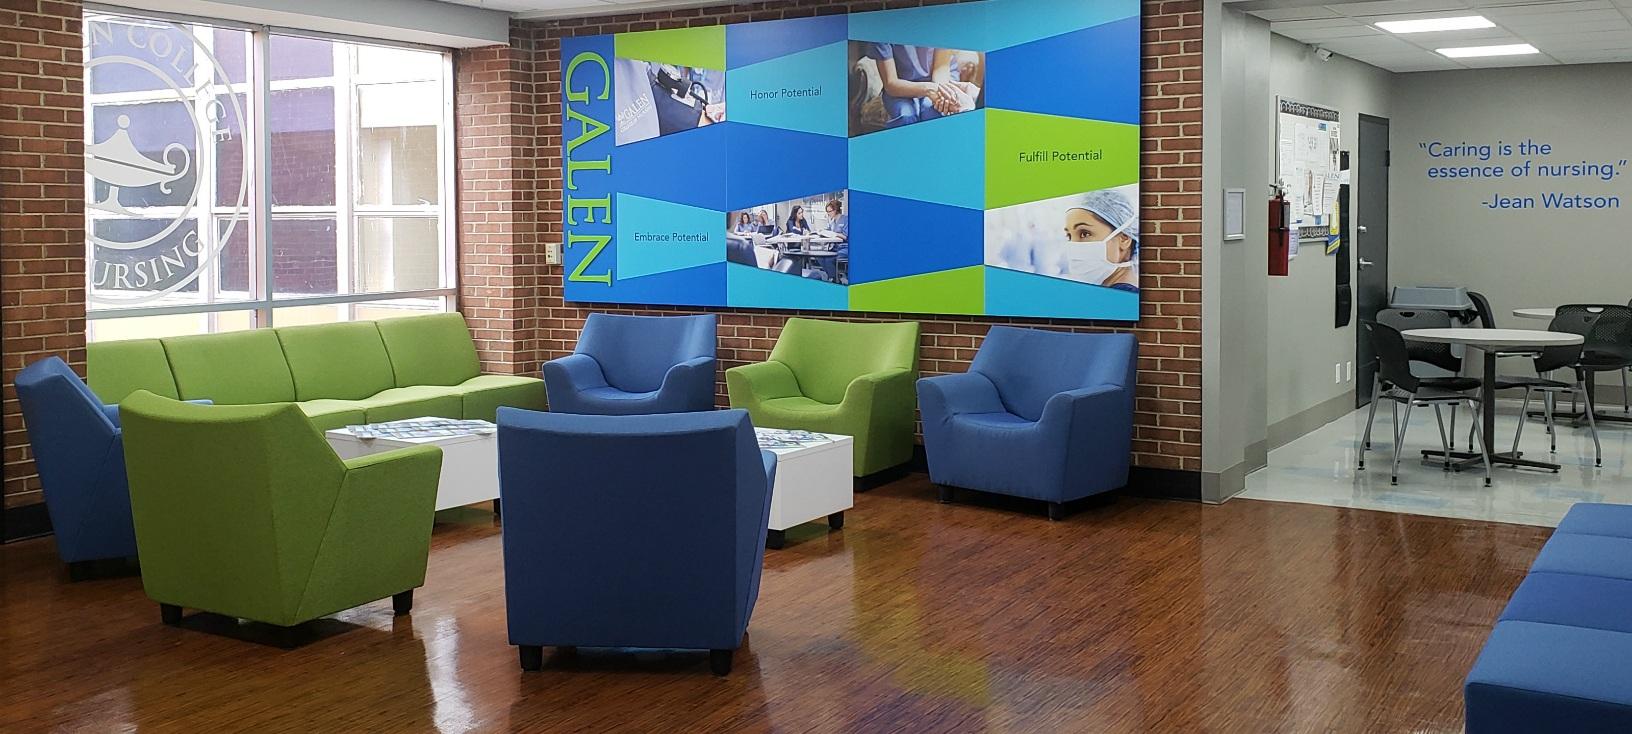 University Of Kentucky Interior Design Curriculum Interiorhalloween Co